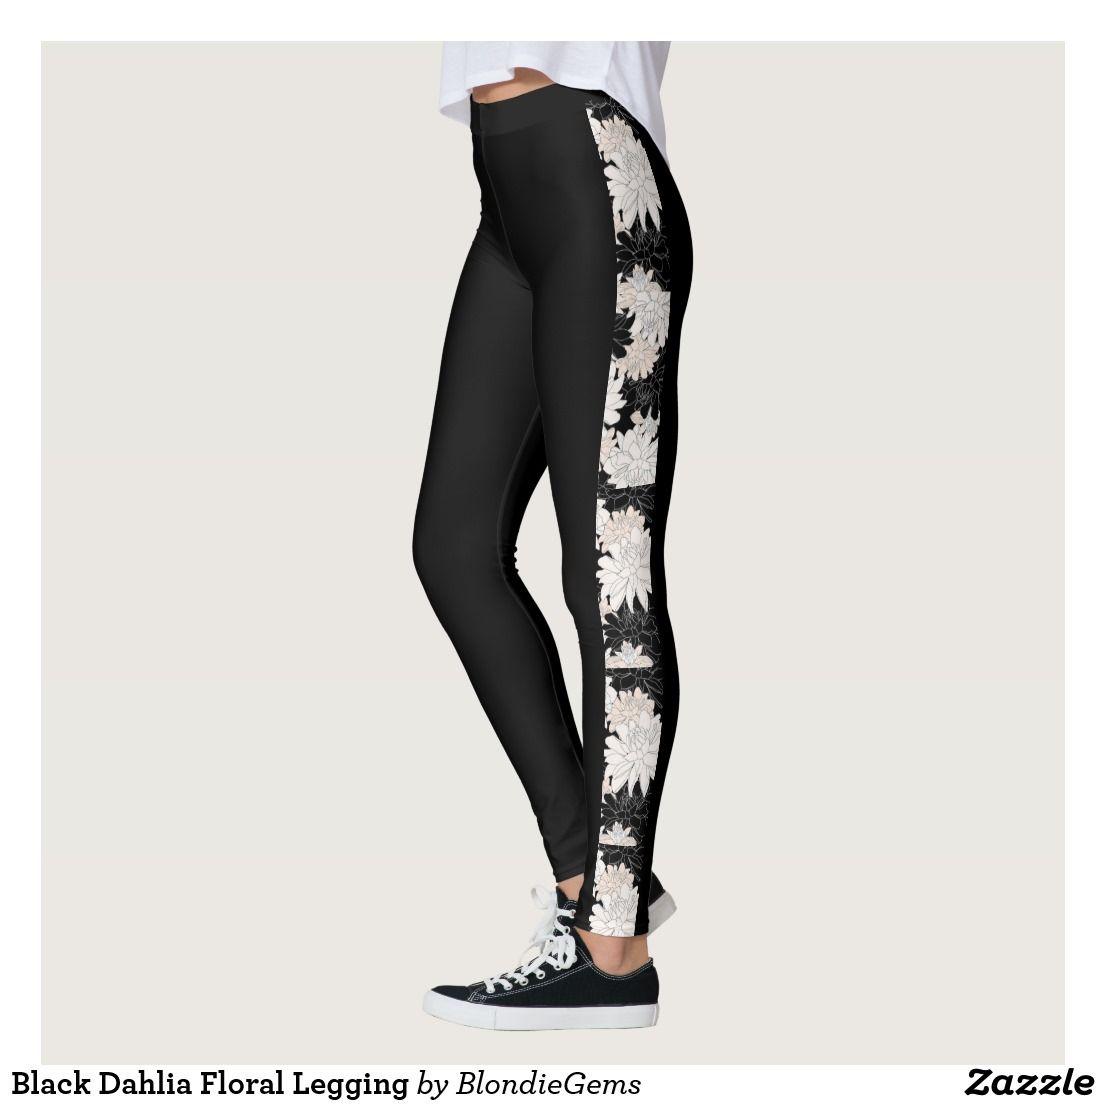 ffcbd299026f9 Black Dahlia Floral Legging   Zazzle.com   Exercise   Floral ...